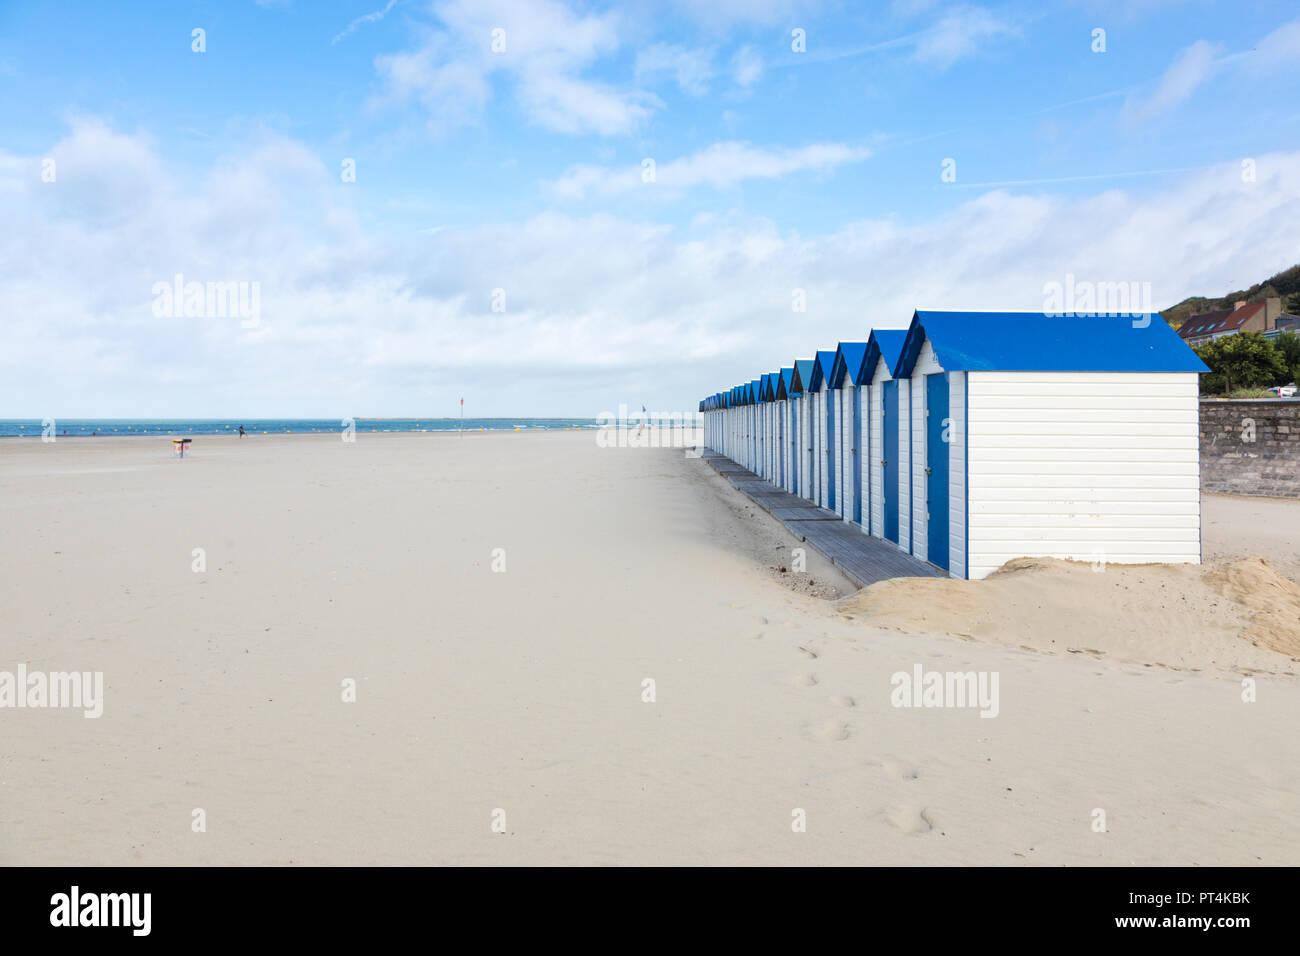 Row of blue and white beach huts at Boulogne-sur-Mer, Pas-de-Calais, France - Stock Image